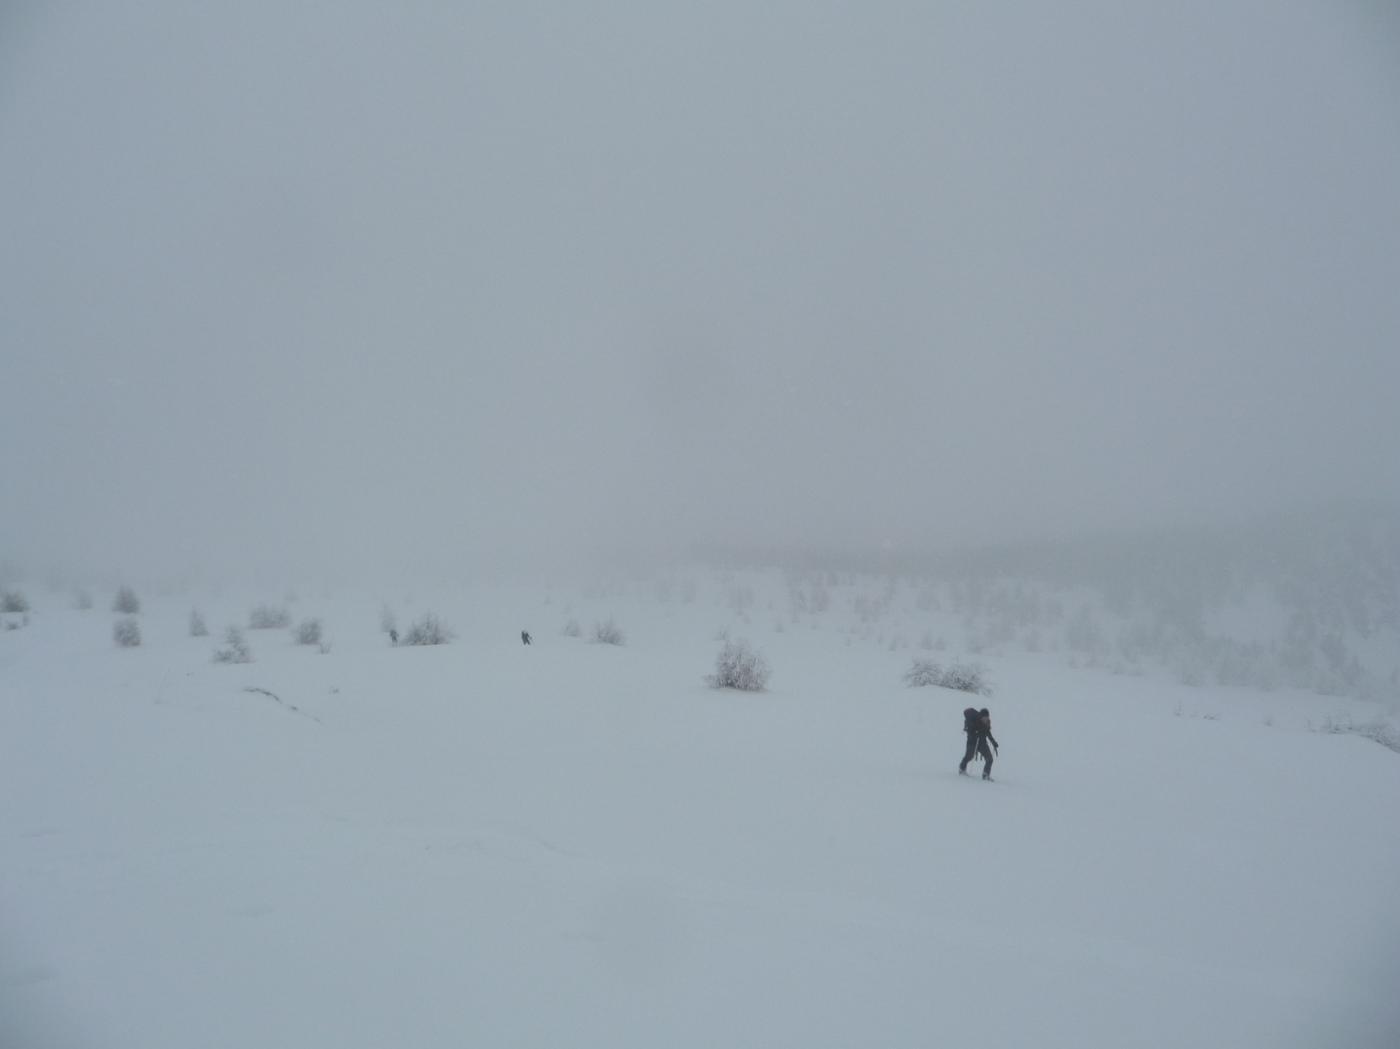 Ultimi metri sotto la nevicata